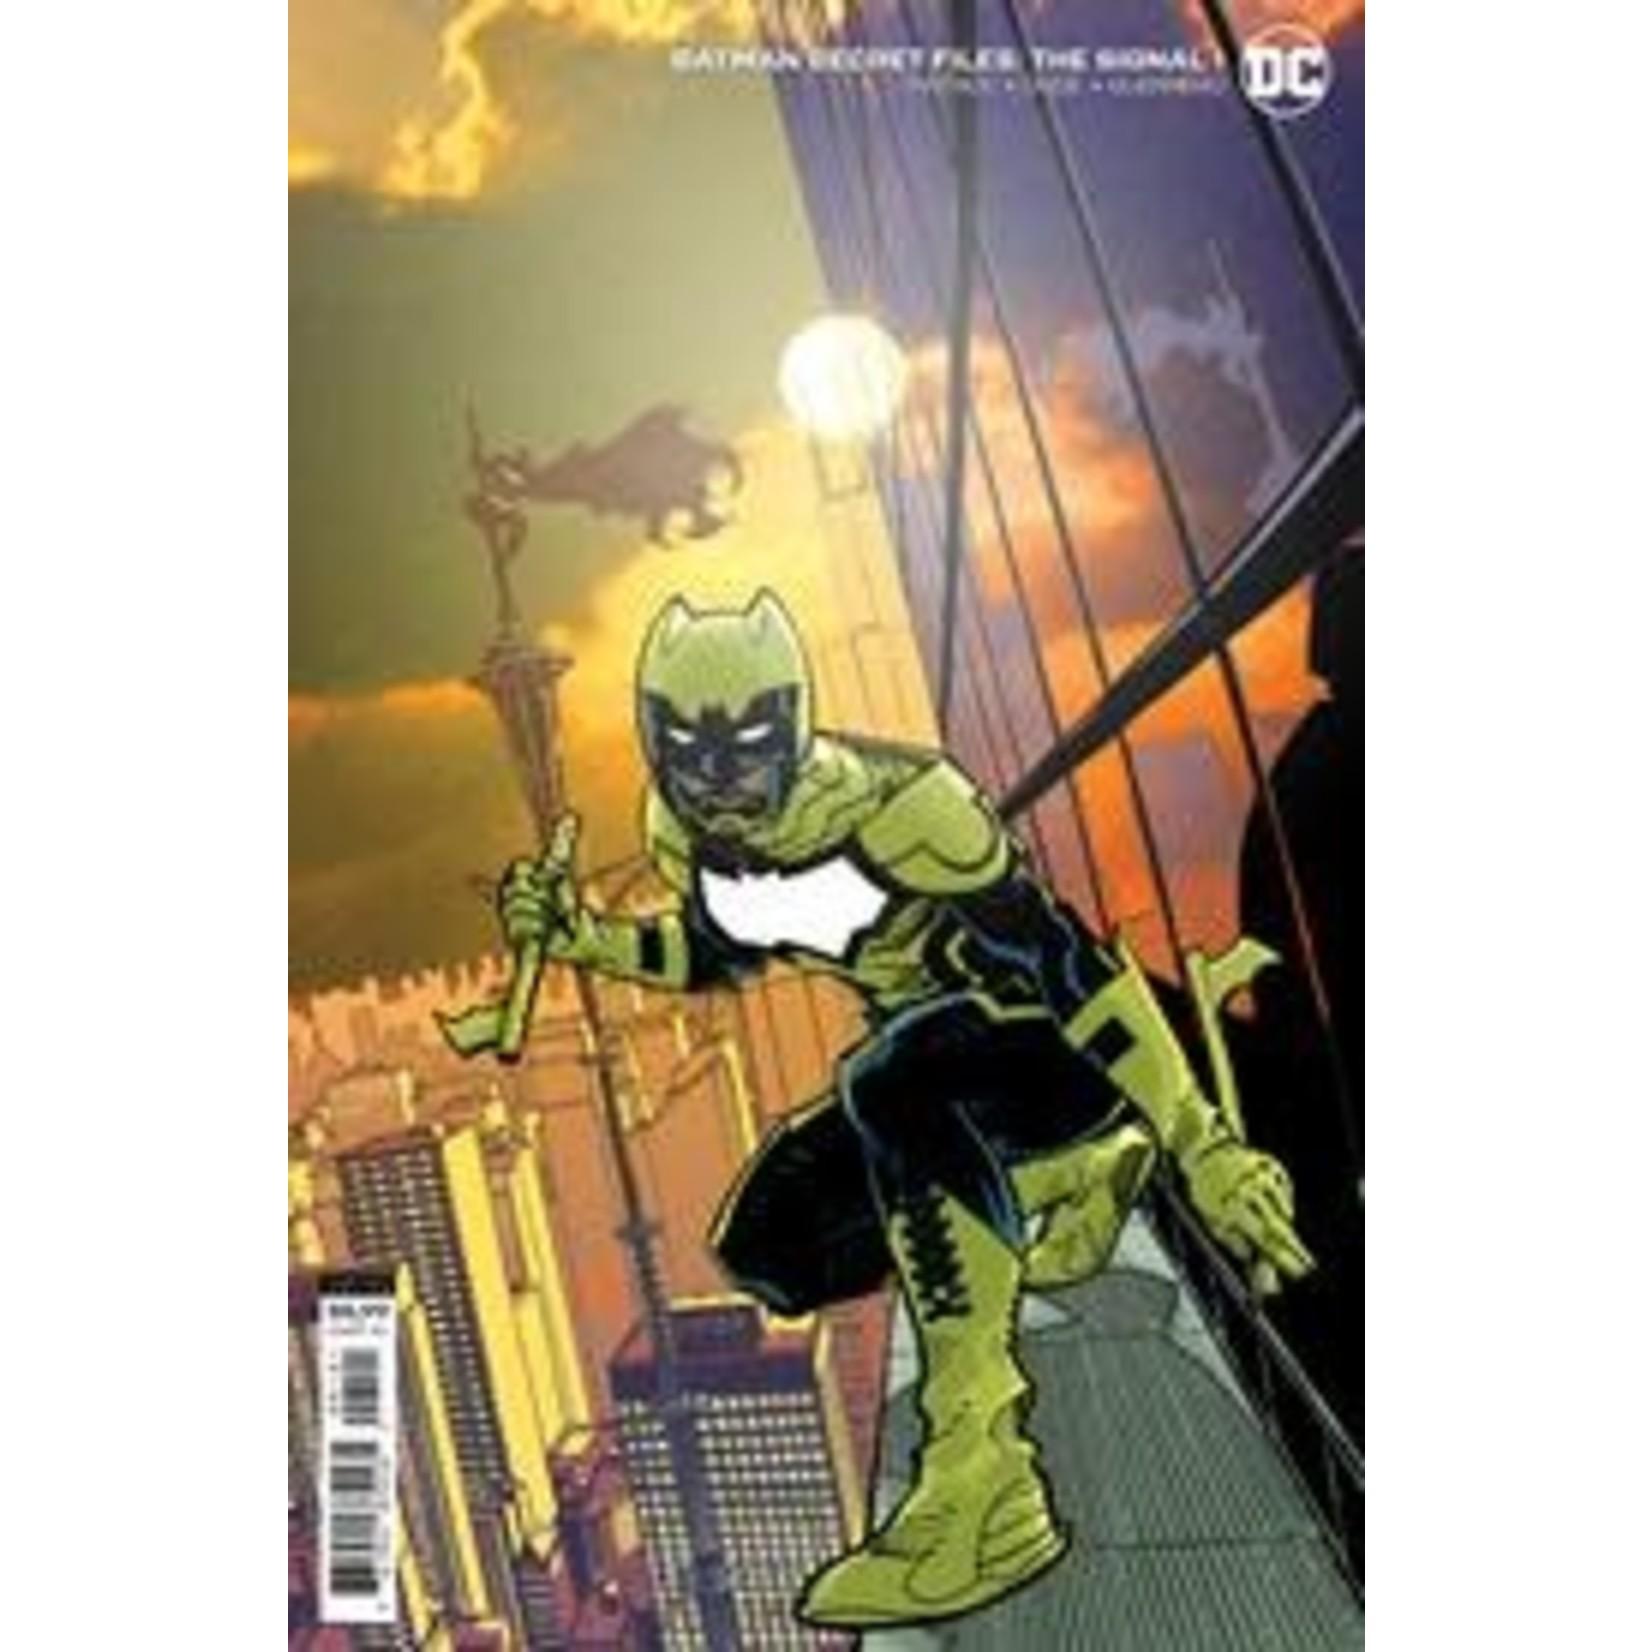 DCU Batman Secret Files The Signal #1 (One Shot) Cvr B